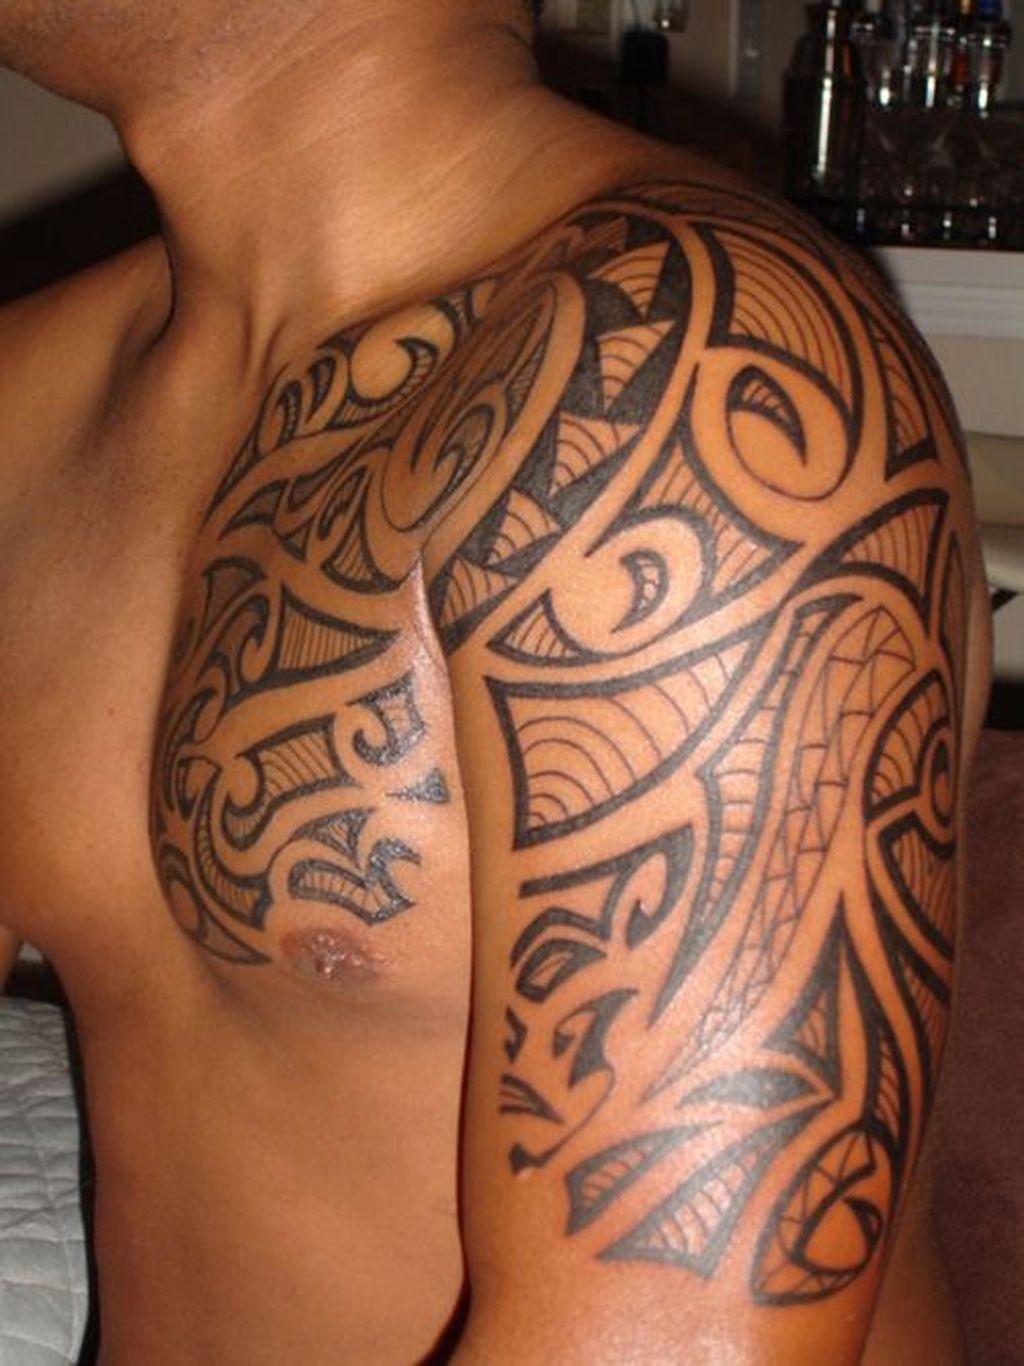 46 Excellent Shoulder Tattoo Design Ideas For Men You Can